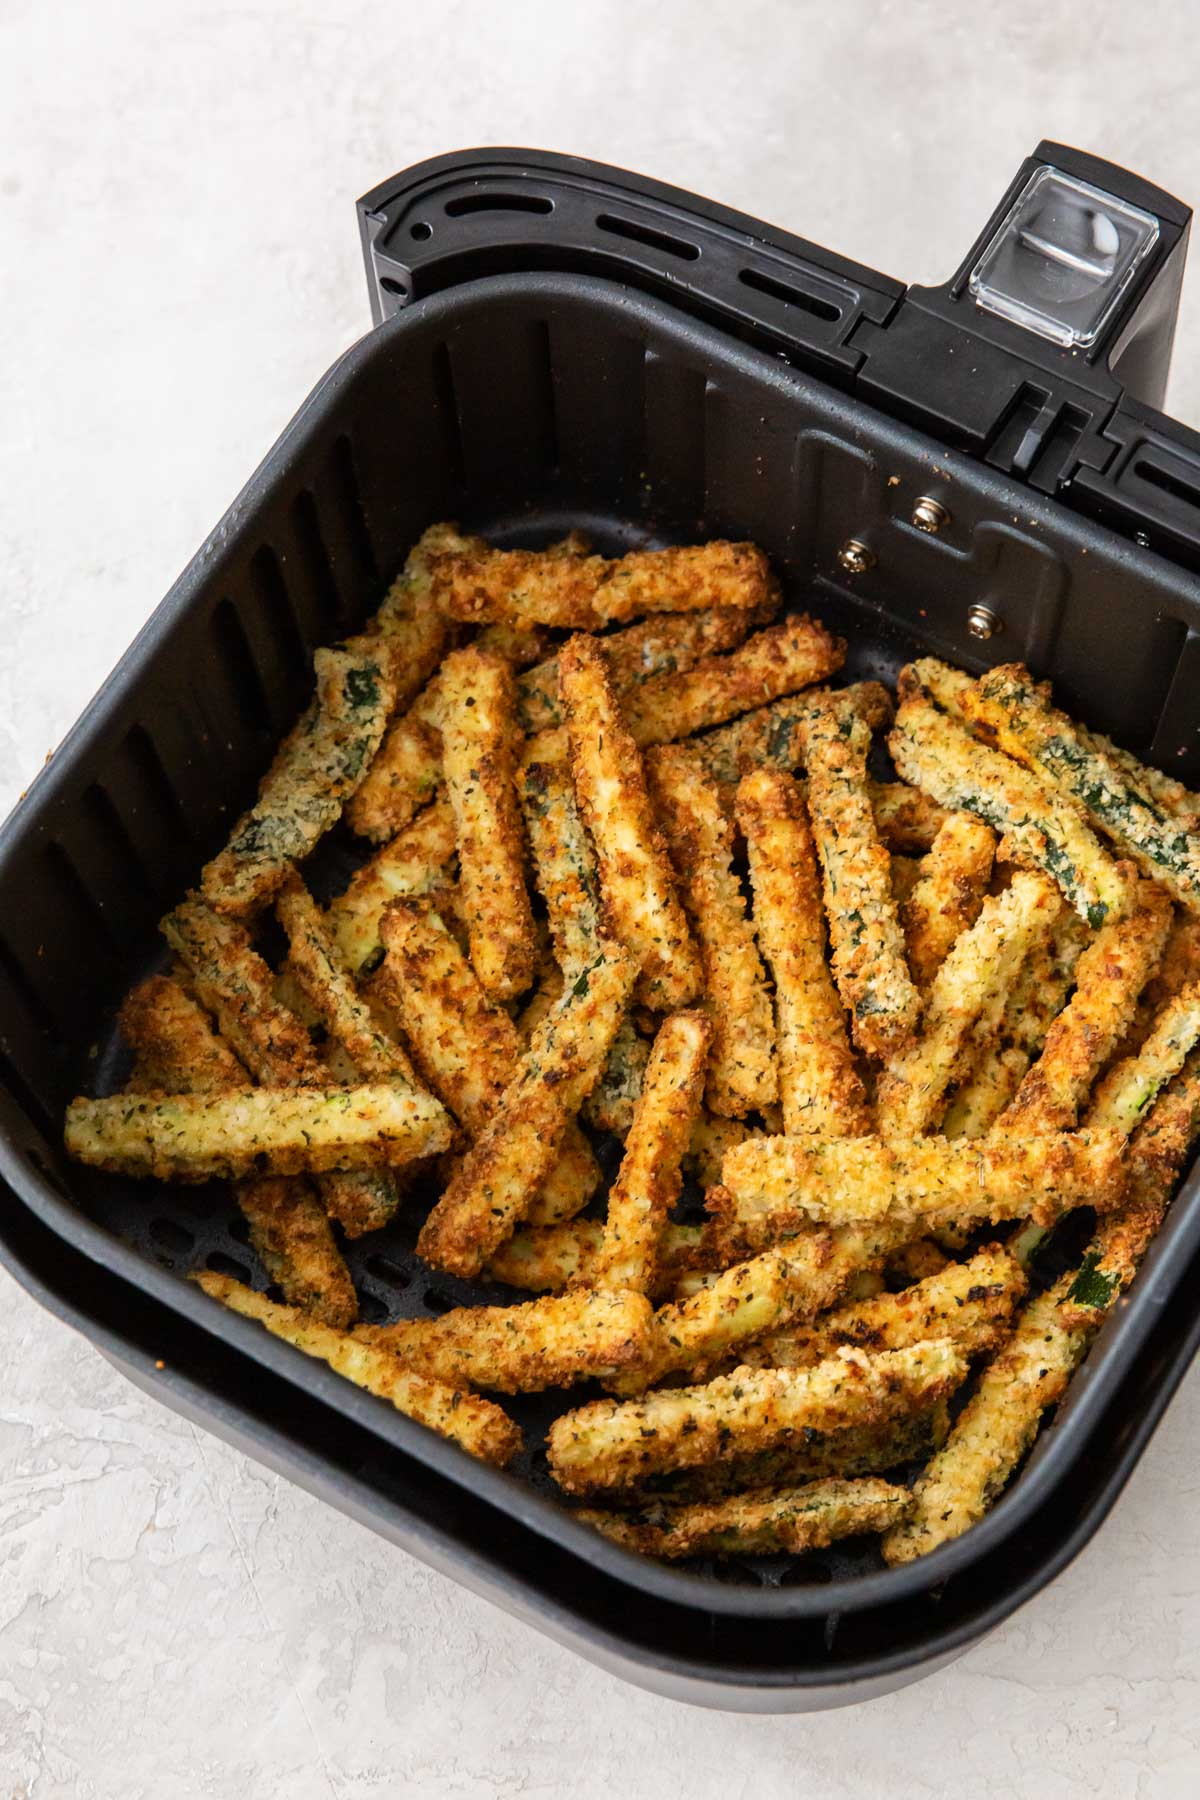 crispy zucchini fries in air fryer